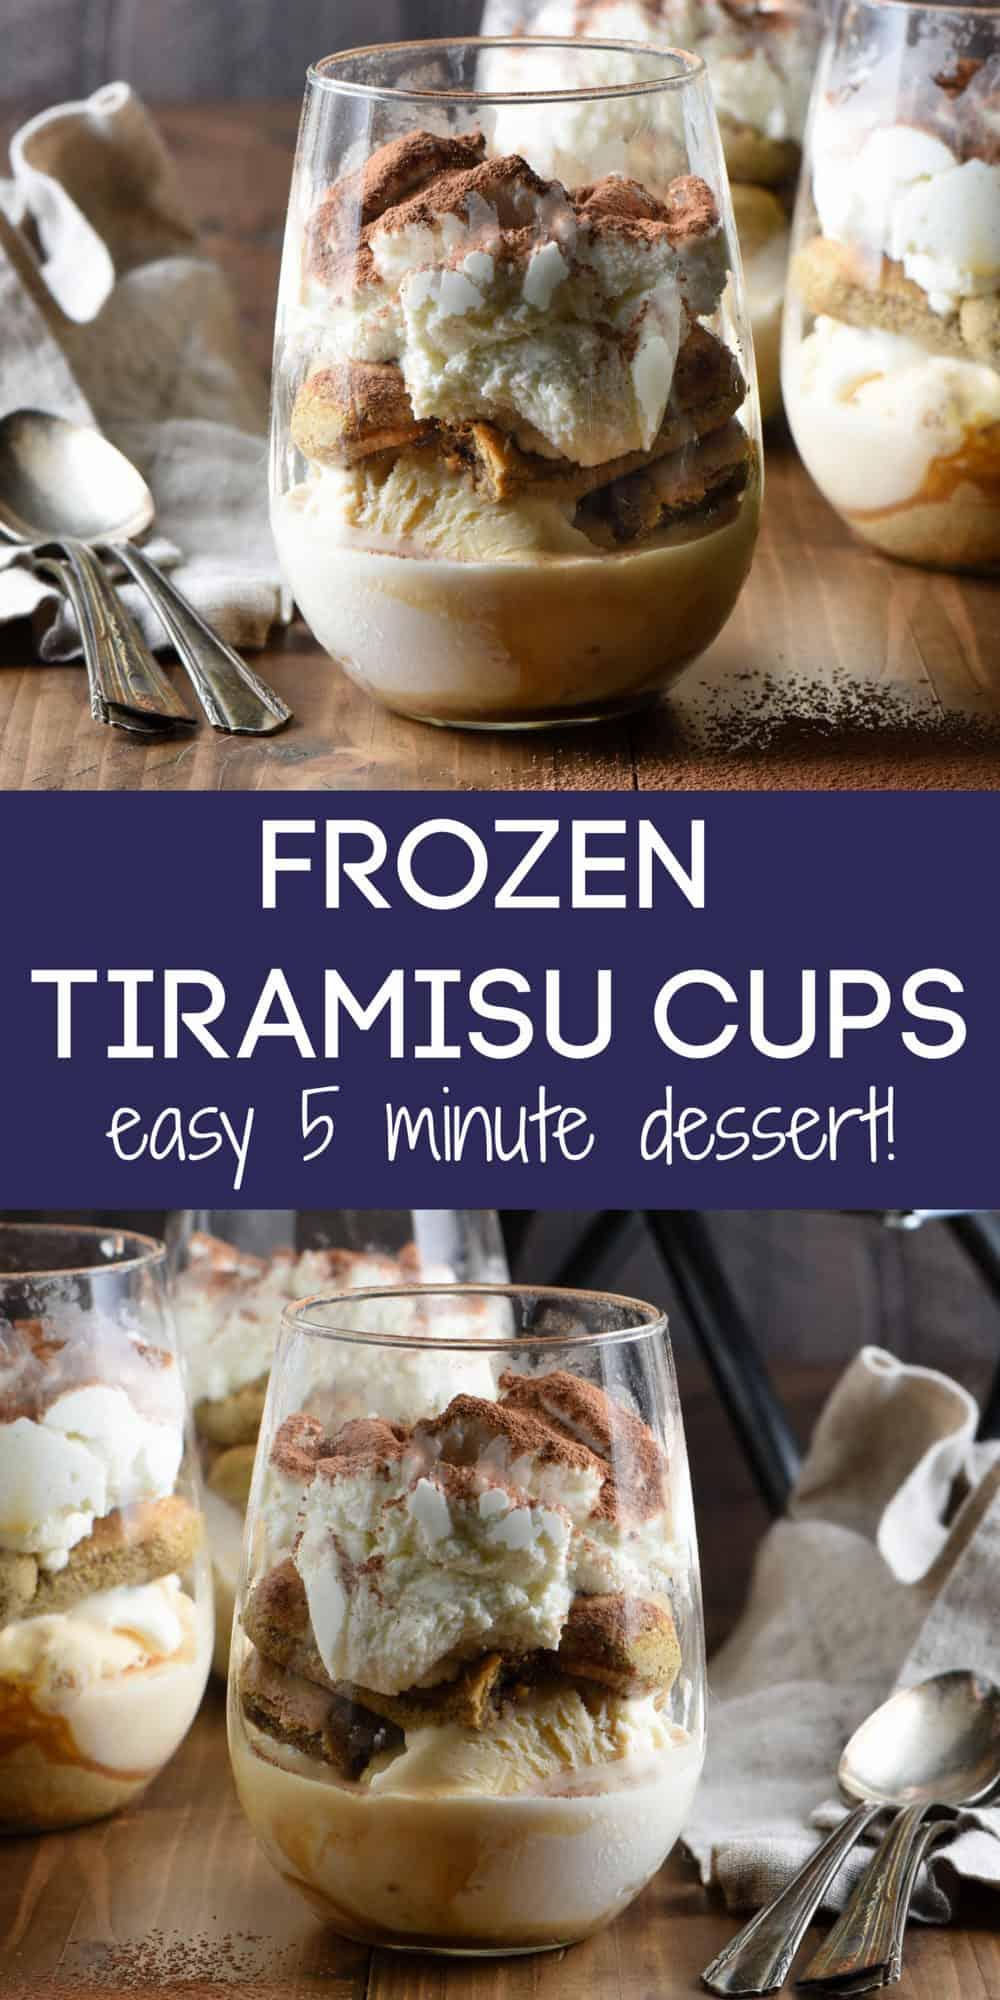 Collage of images of tiramisu trifle glasses with overlay: FROZEN TIRAMISU CUPS easy 5 minute dessert!